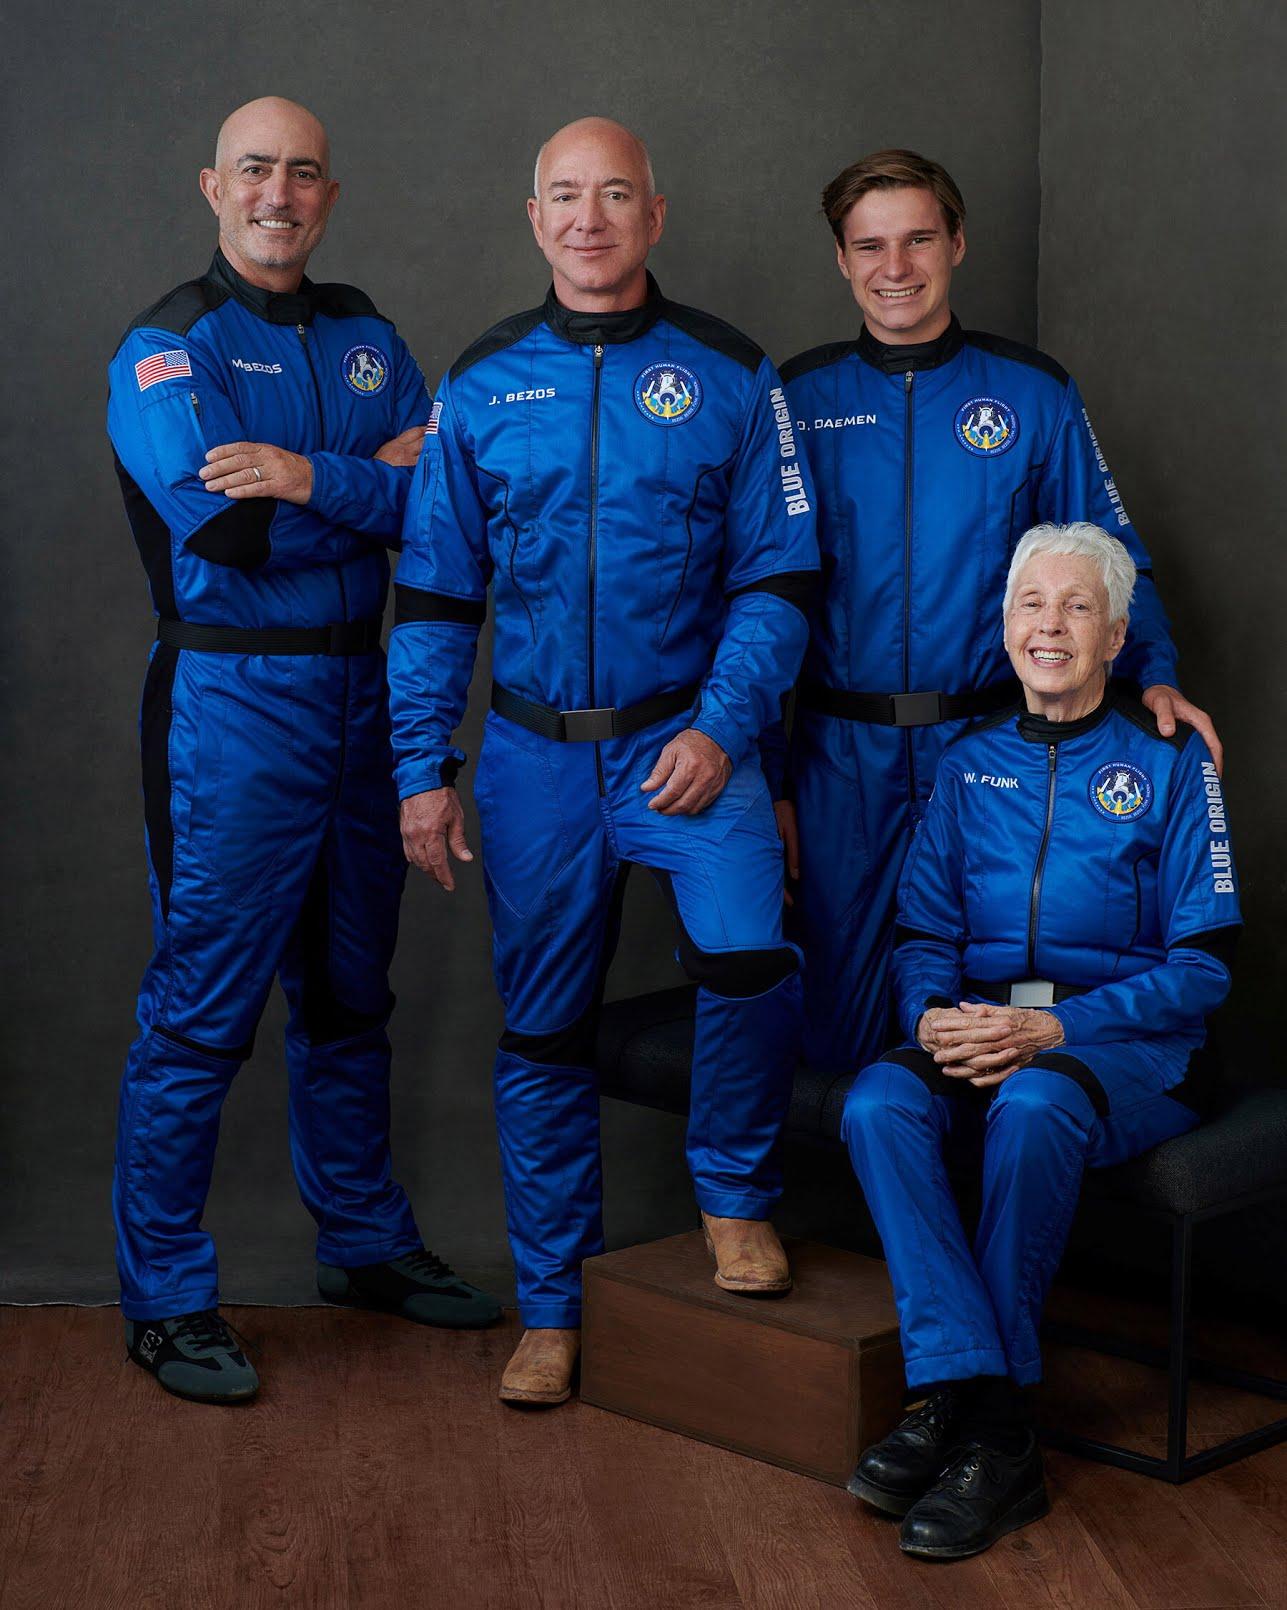 From left, Mark Bezos, Jeff Bezos, Mr. Daemen and Ms. Funk.